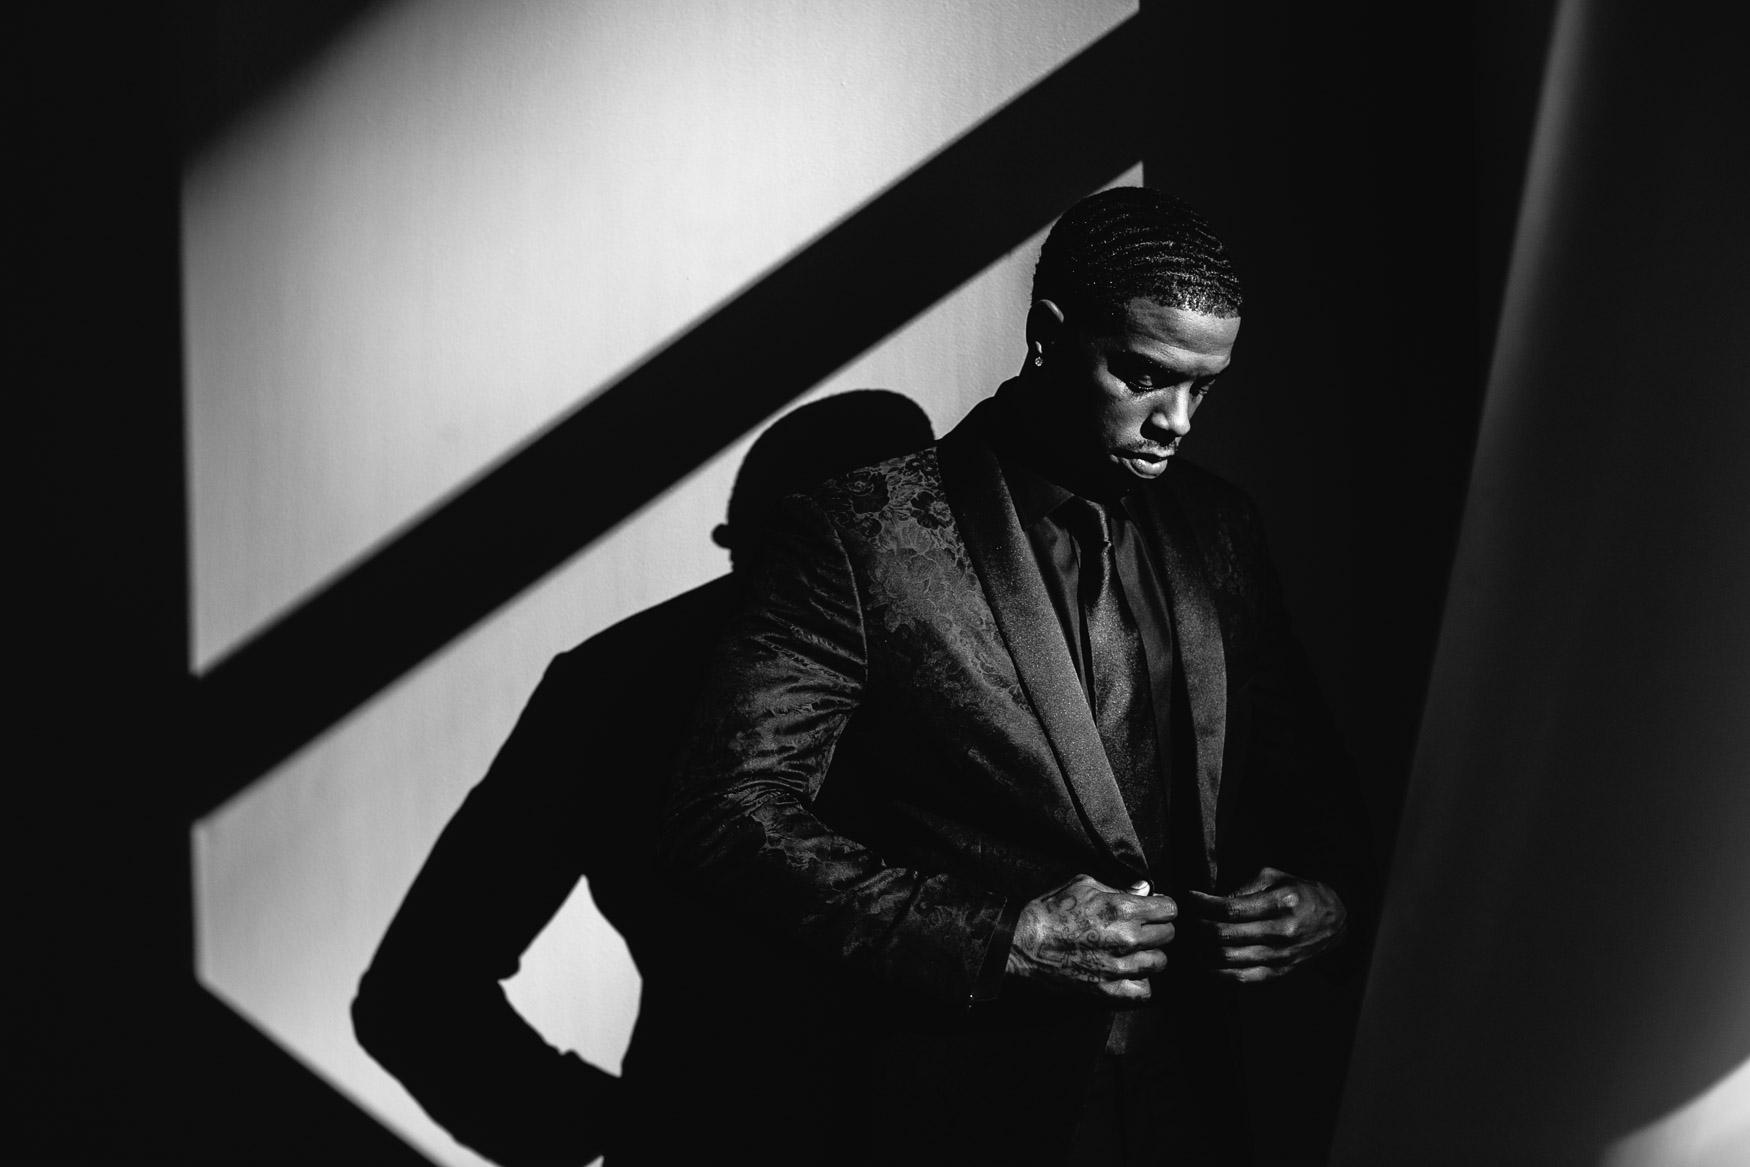 Groom in black suit in dramatic window lighting by Callaway Gable